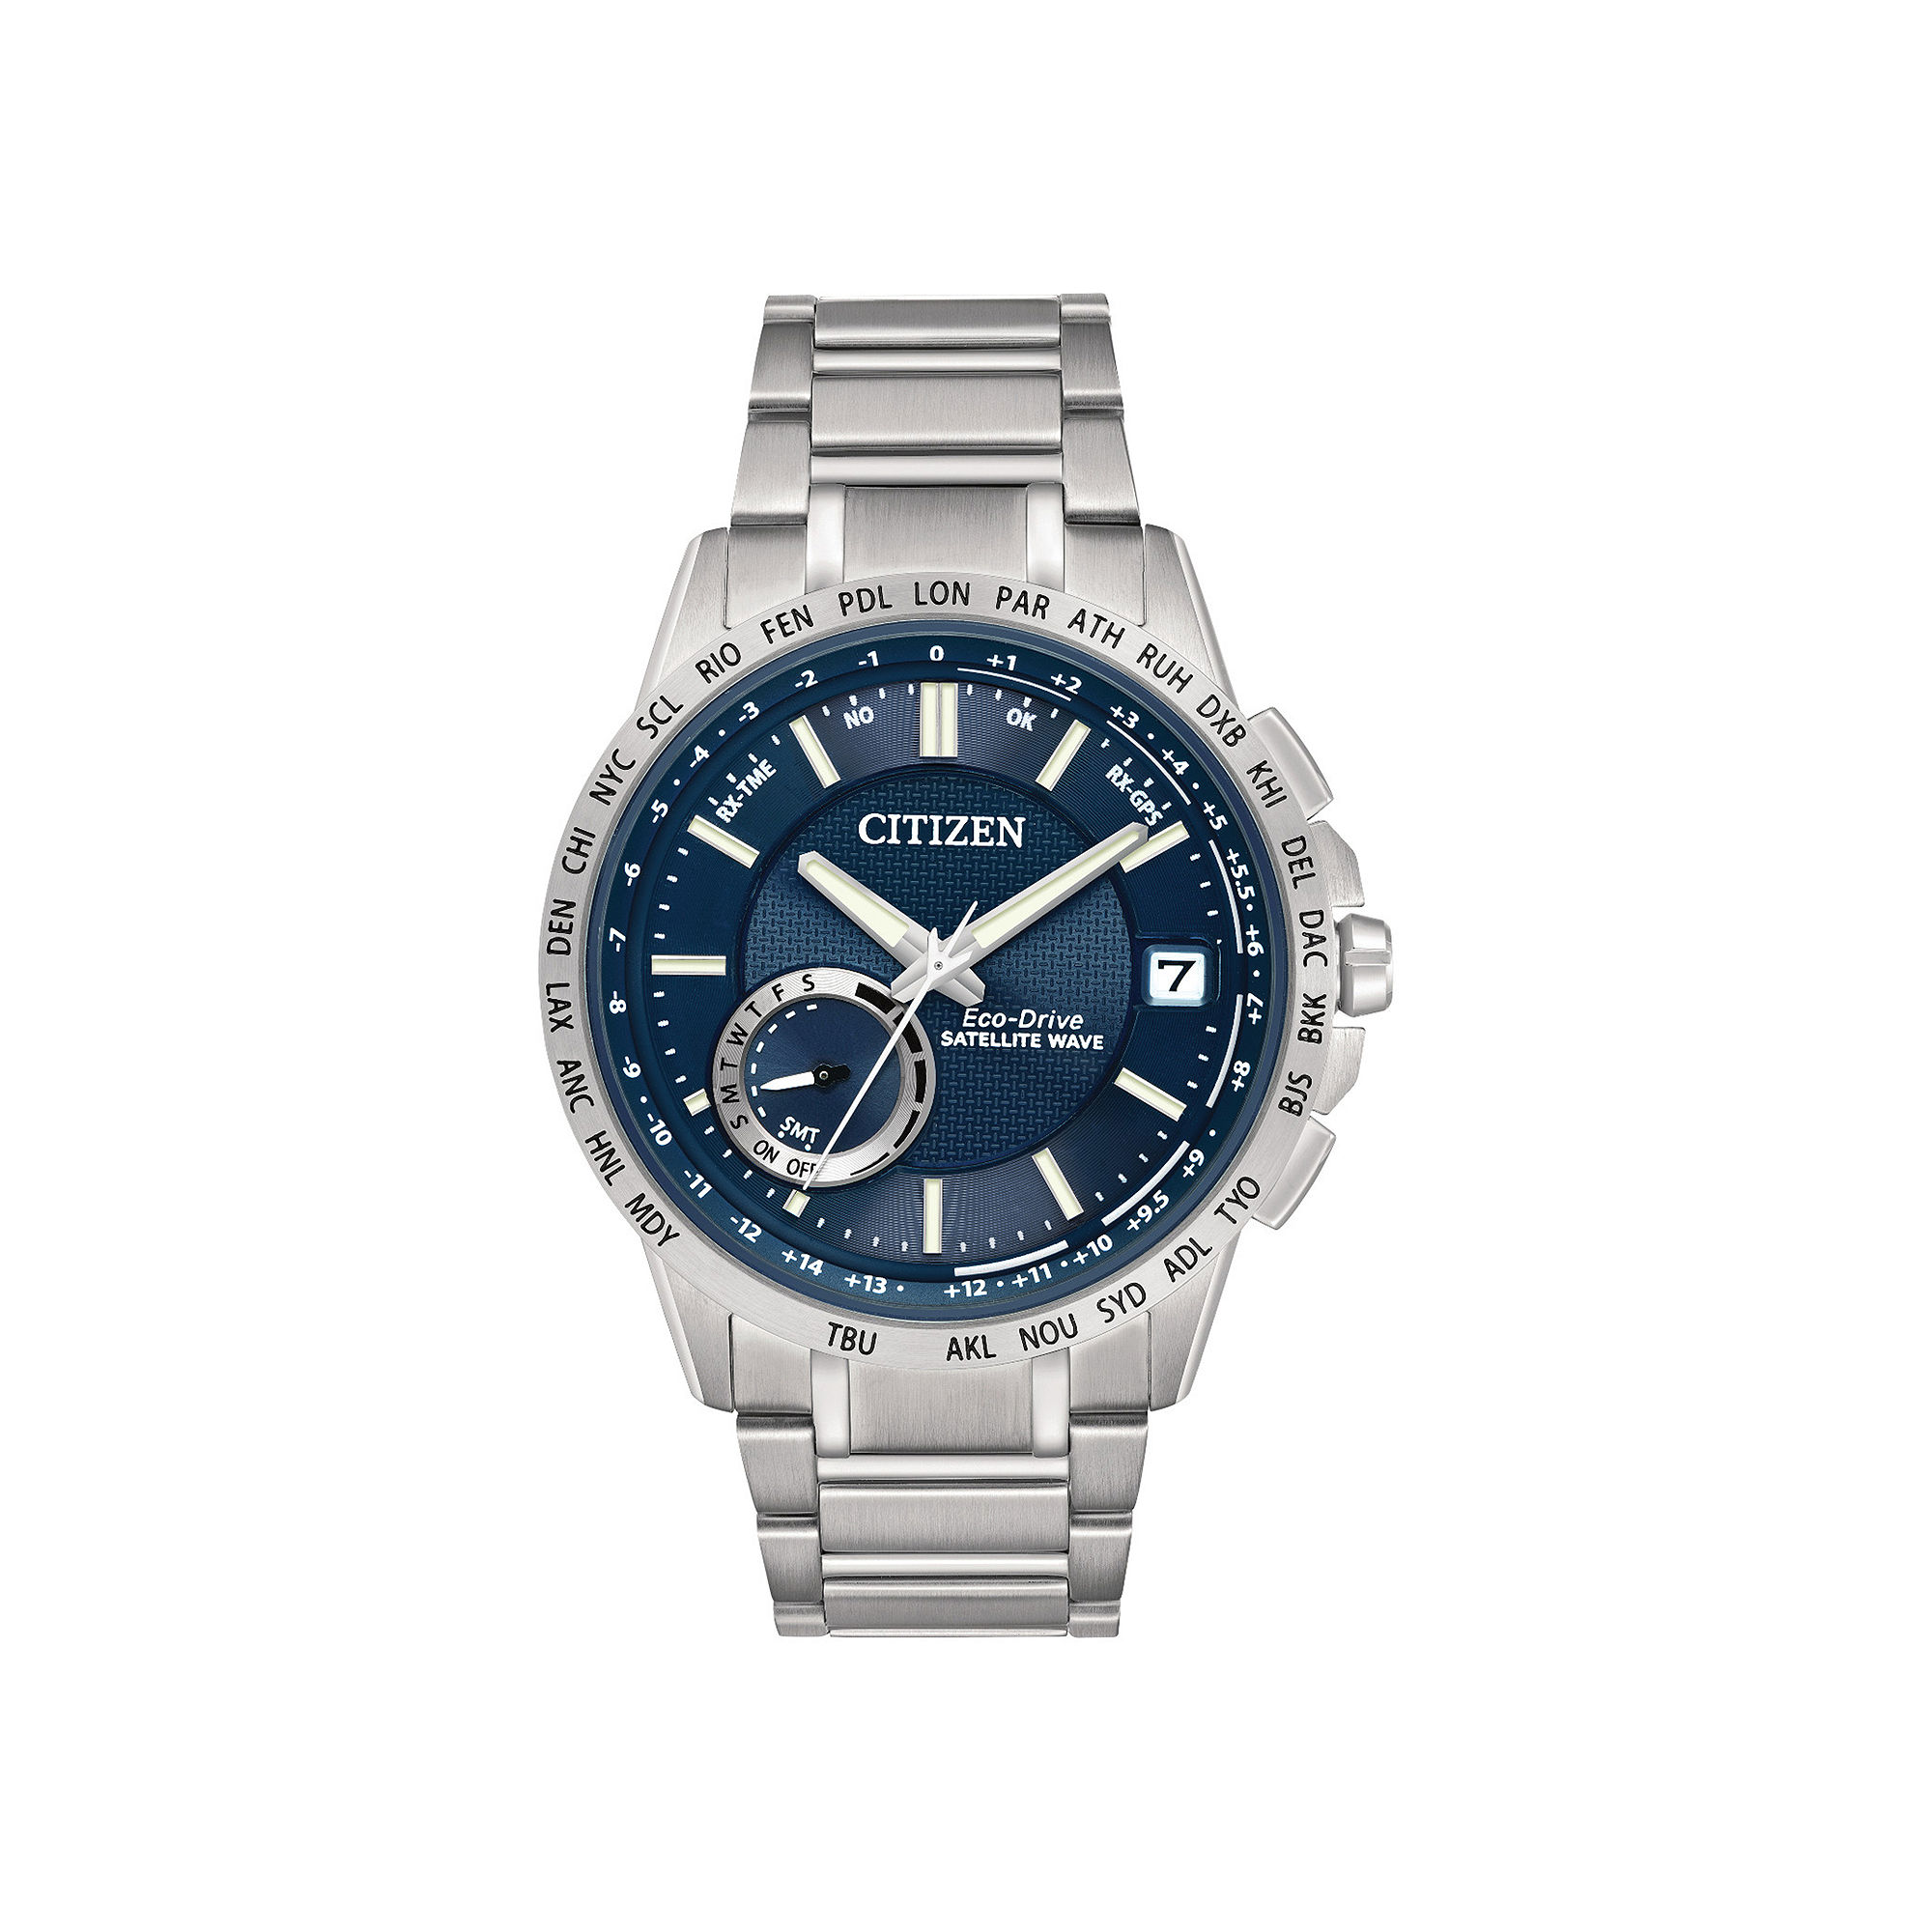 Citizen Eco-Drive Satellite Wave-World Time GPS Mens Watch CC3000-89L